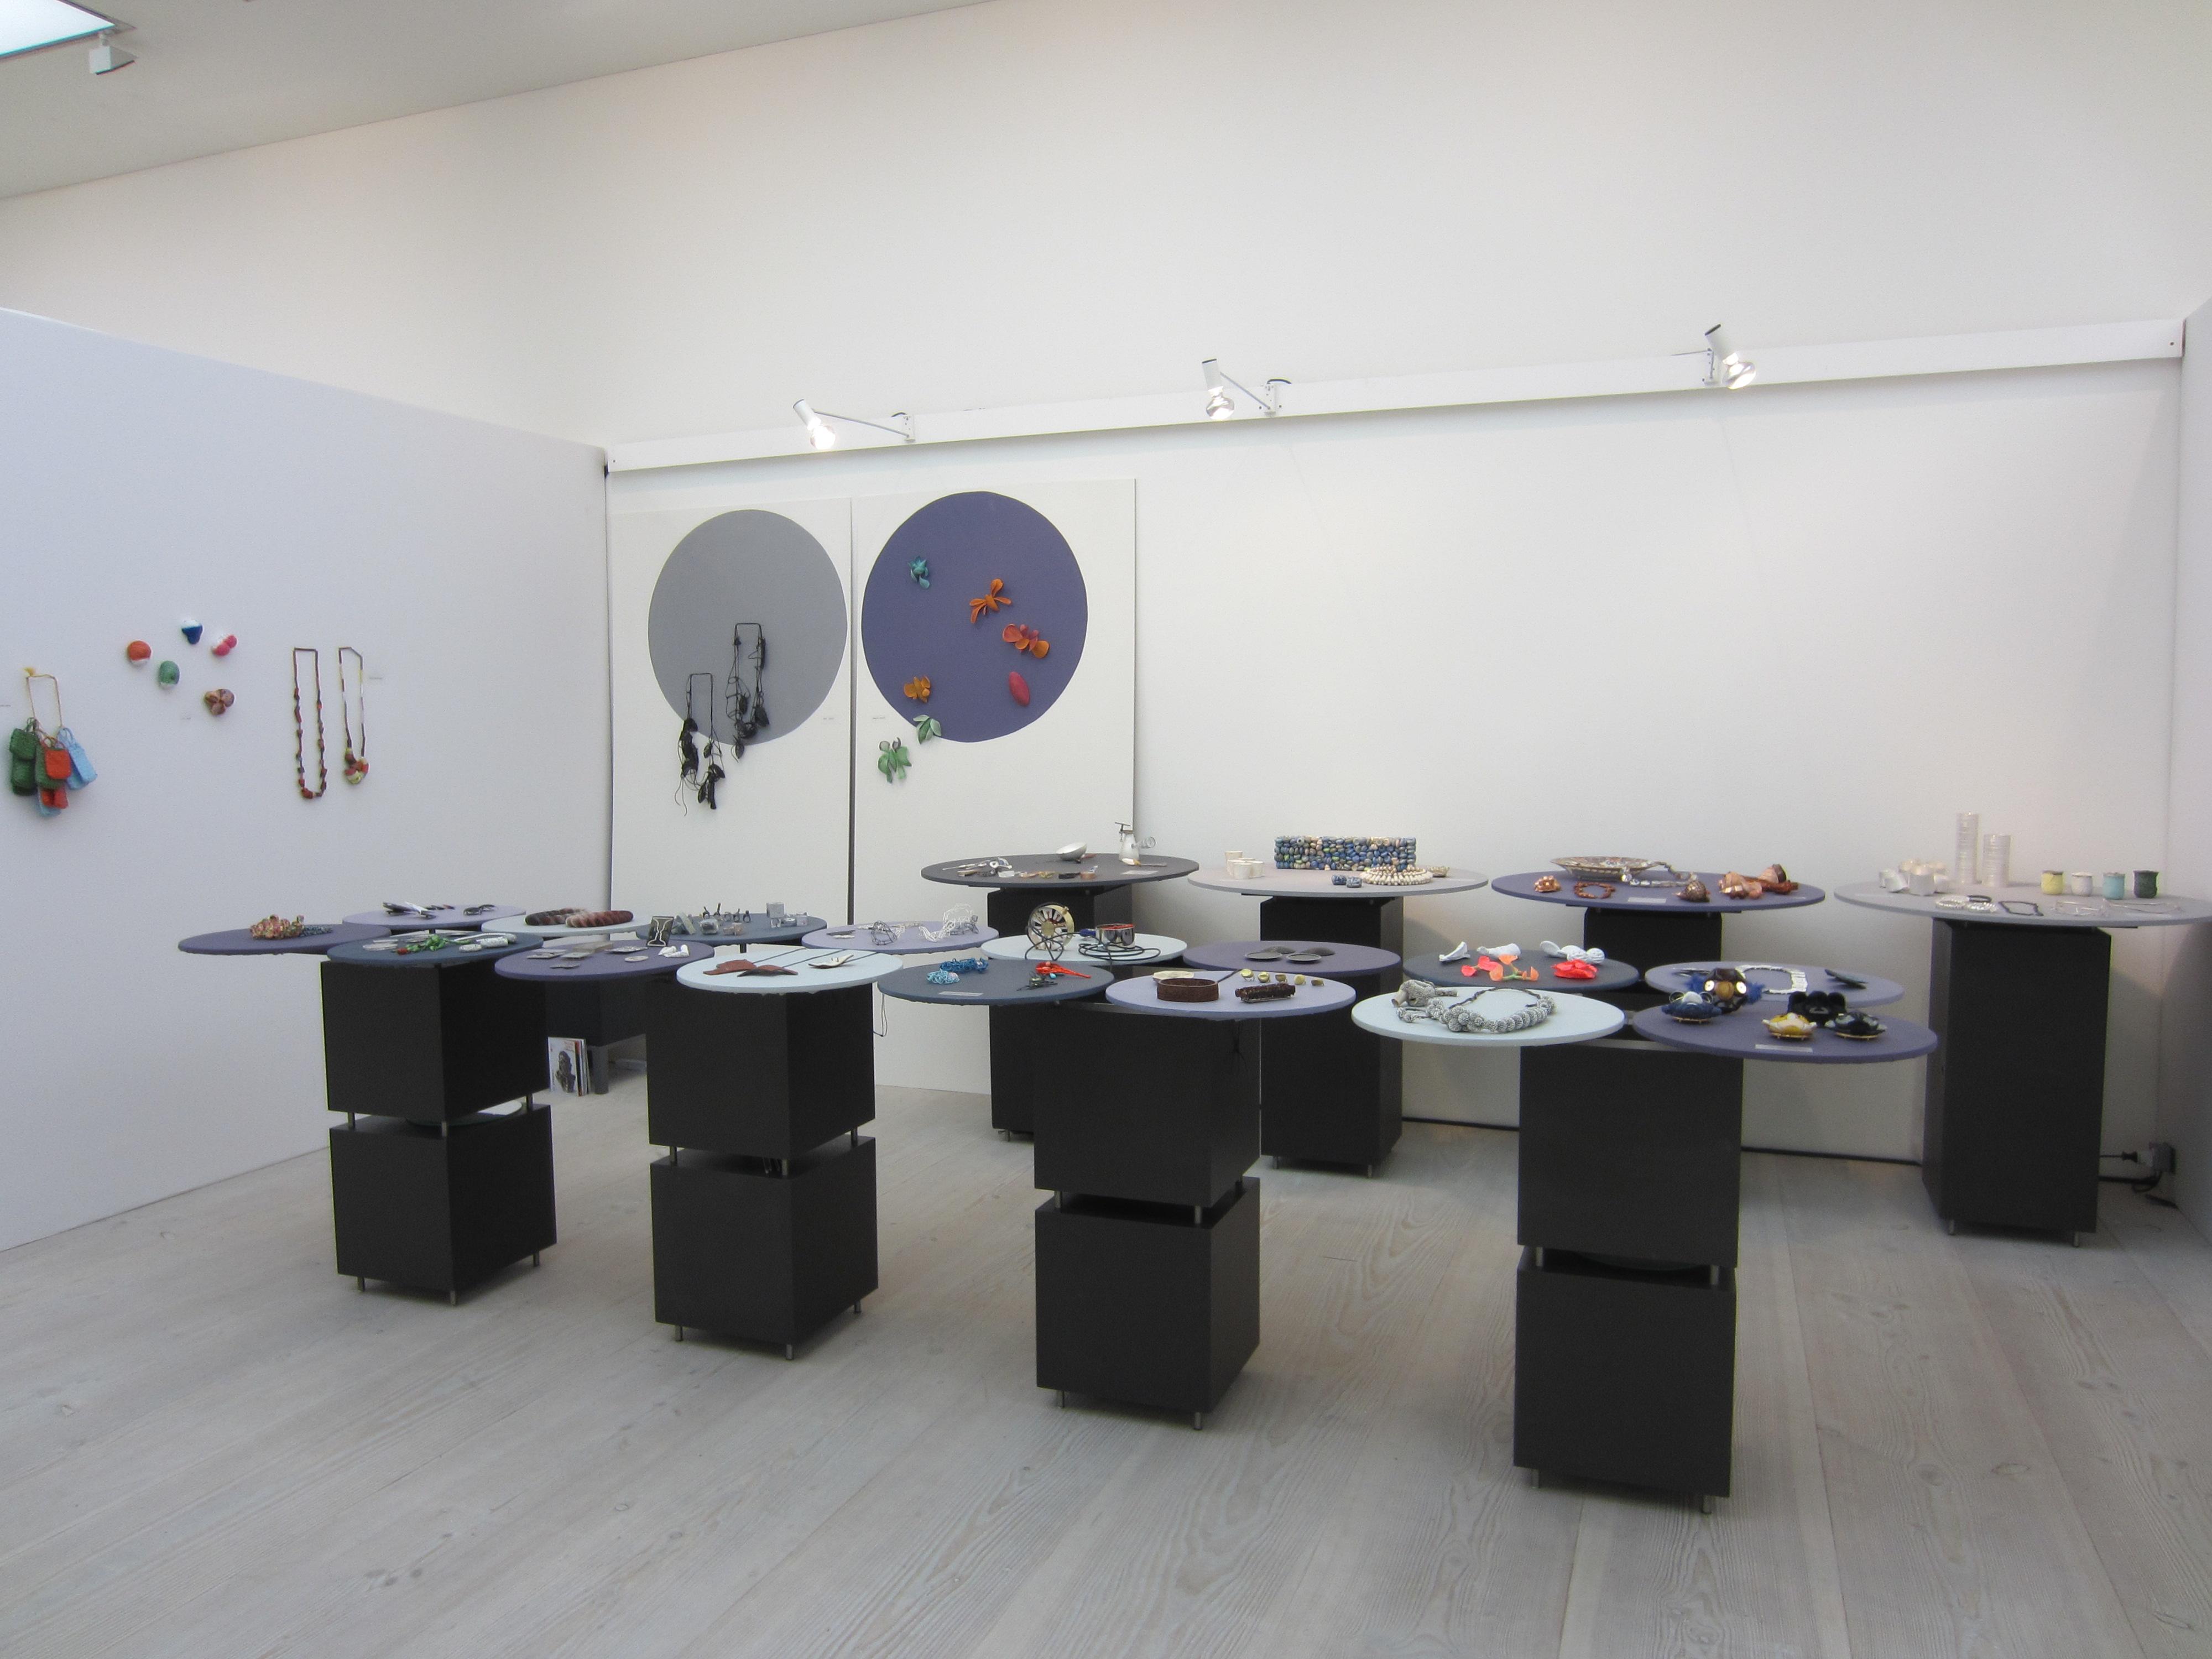 Galerie Ra op Collect, Londen, 2015